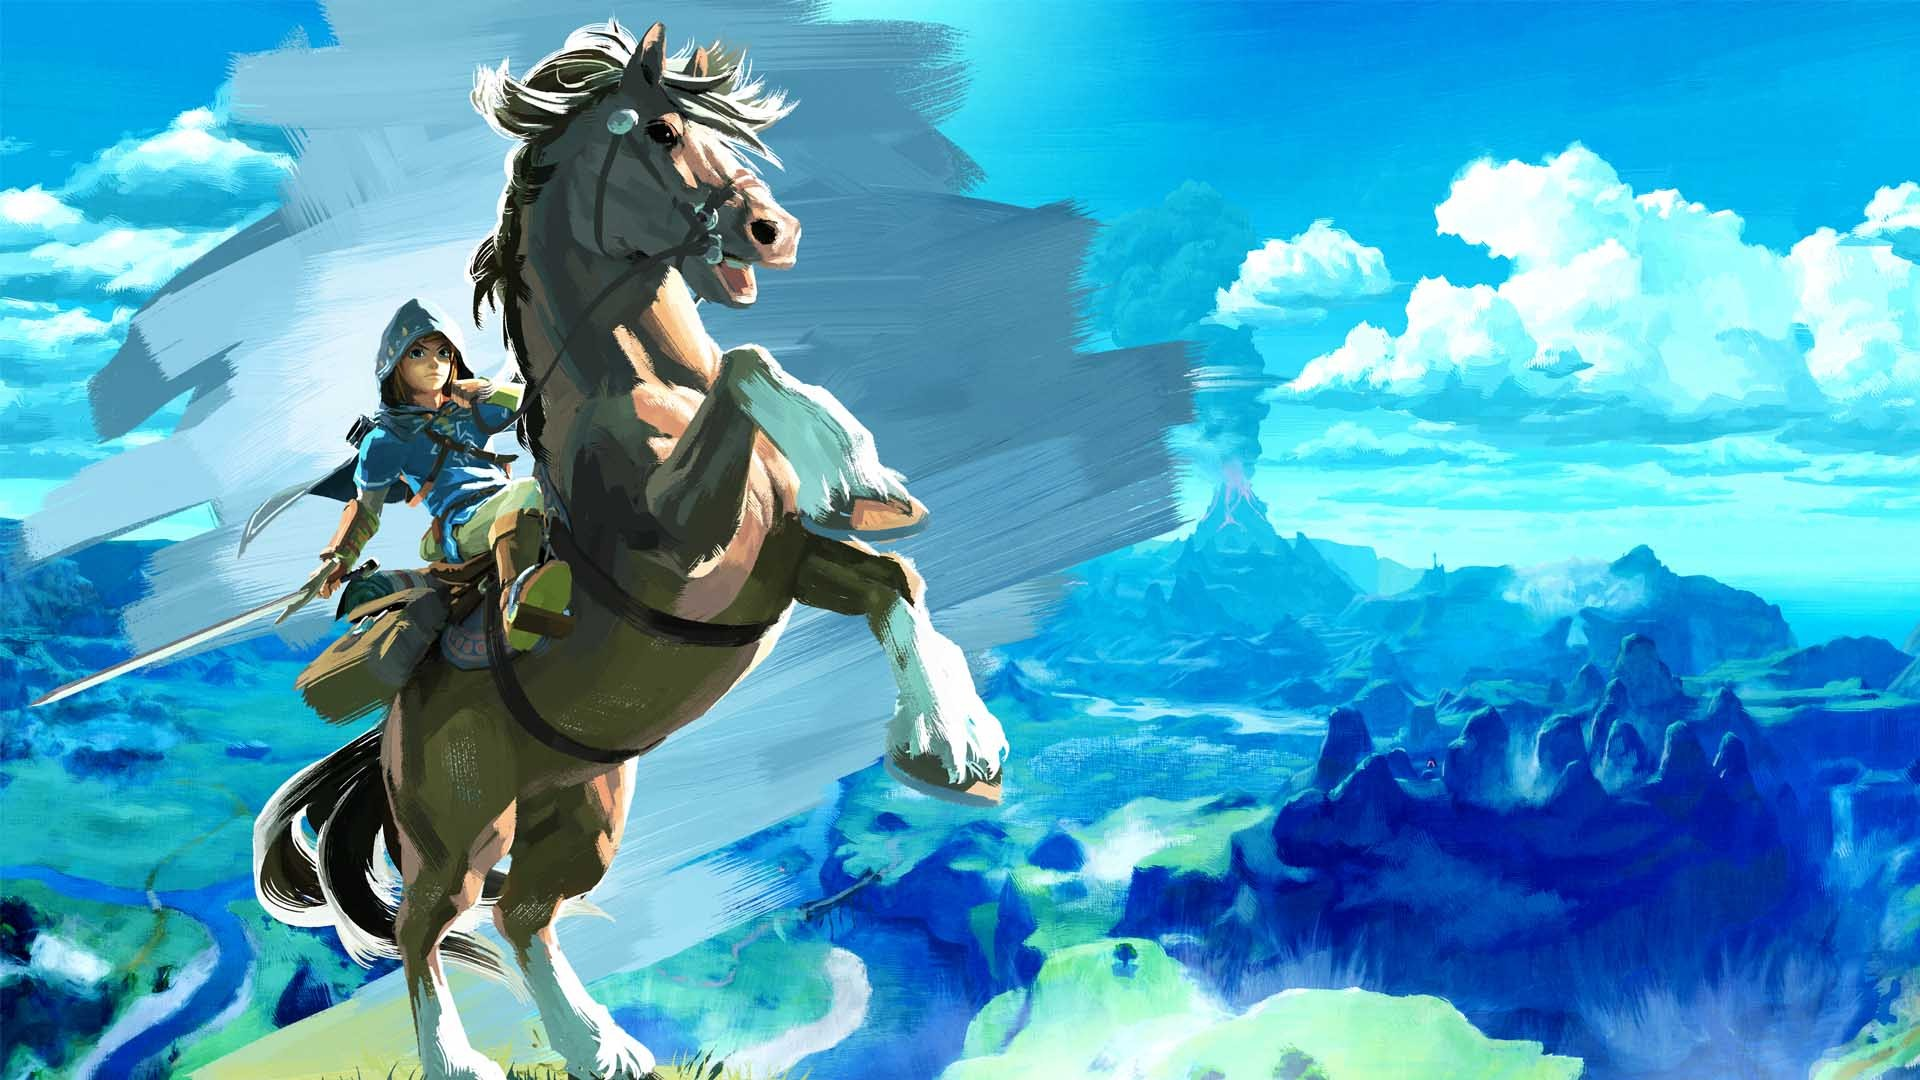 Zelda Botw Wallpaper Iphone X Breath Of The Wild Background 183 ① Download Free High